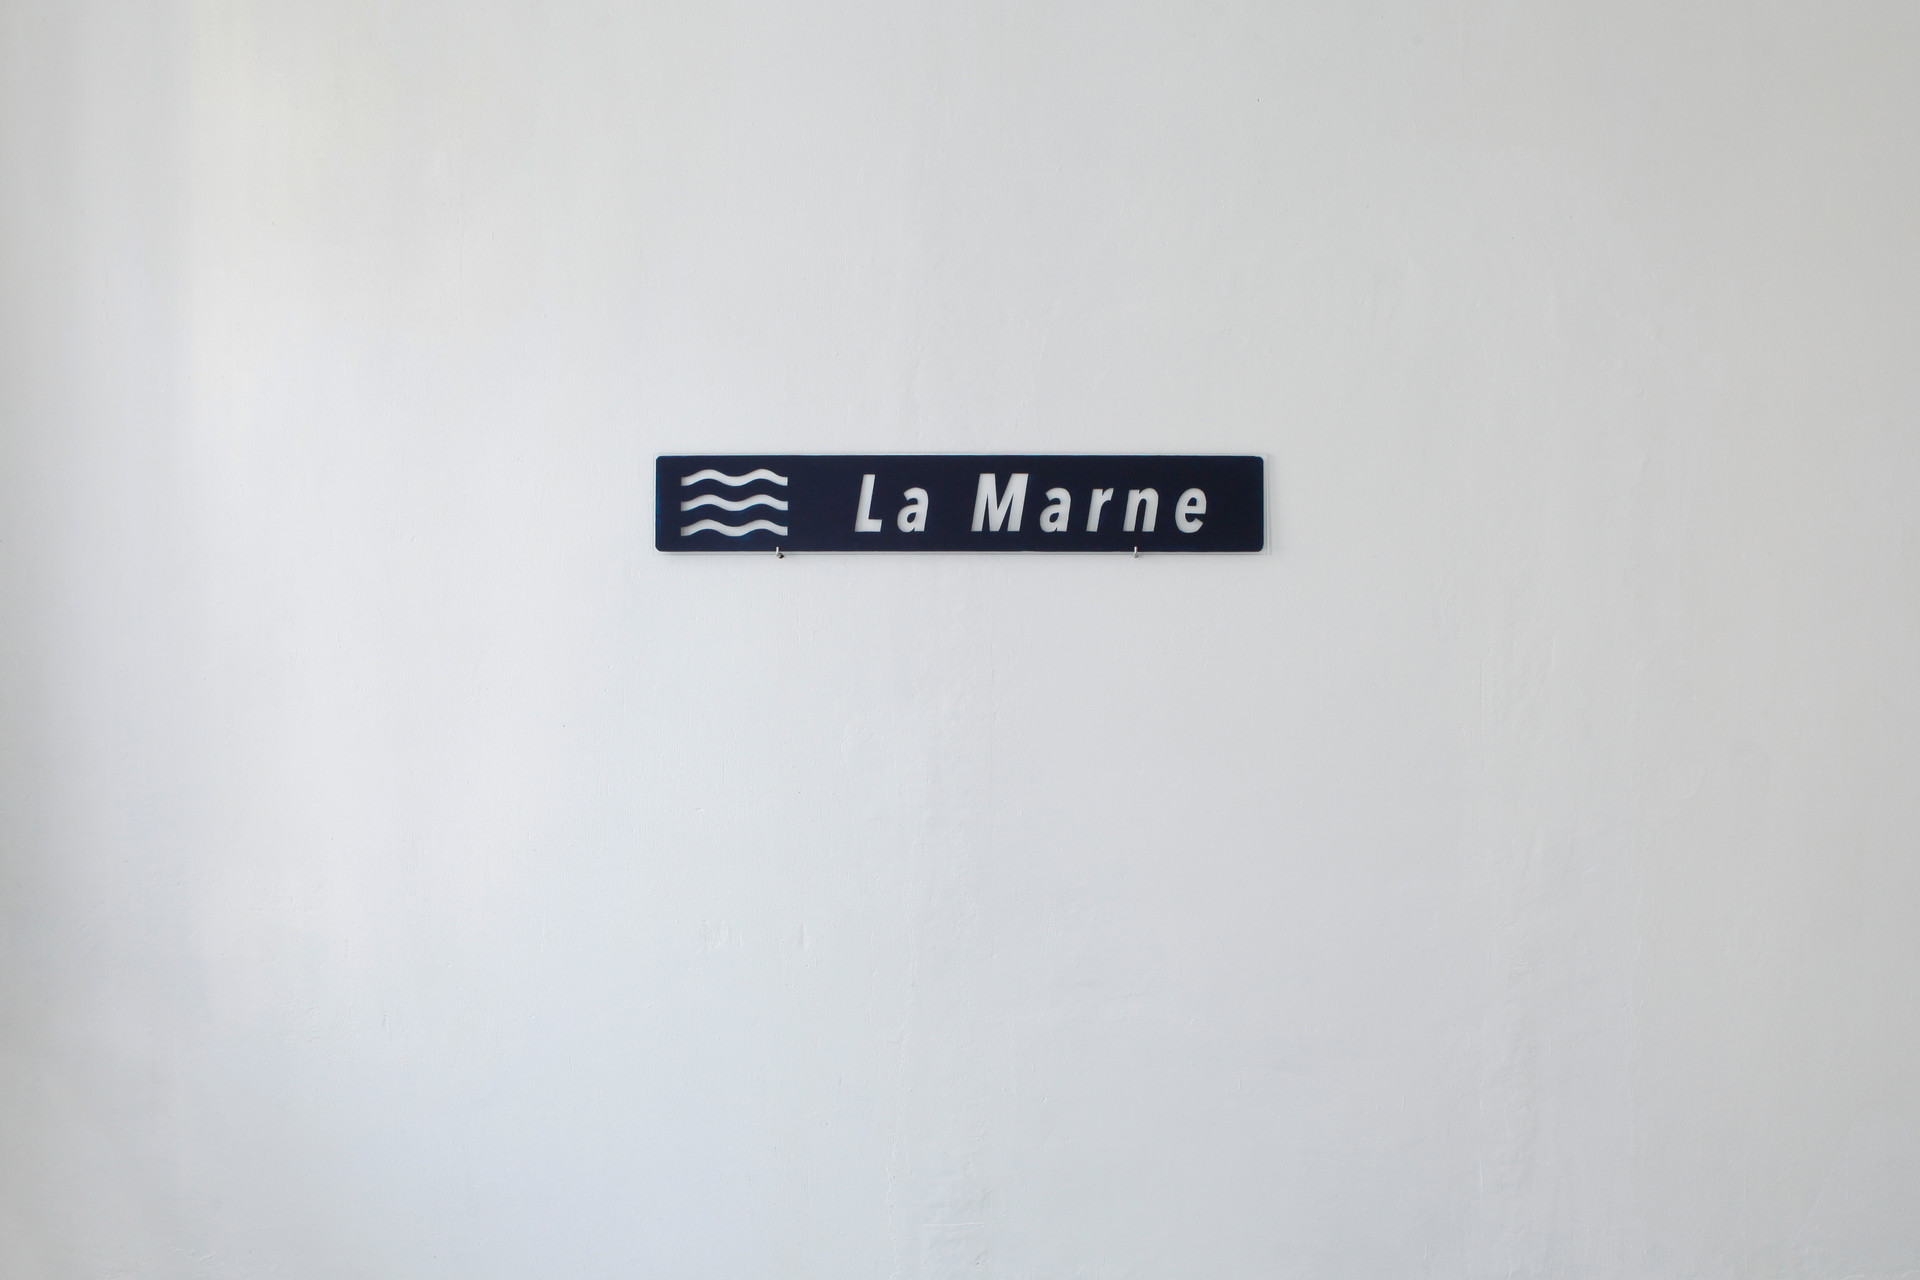 Marne2.jpg